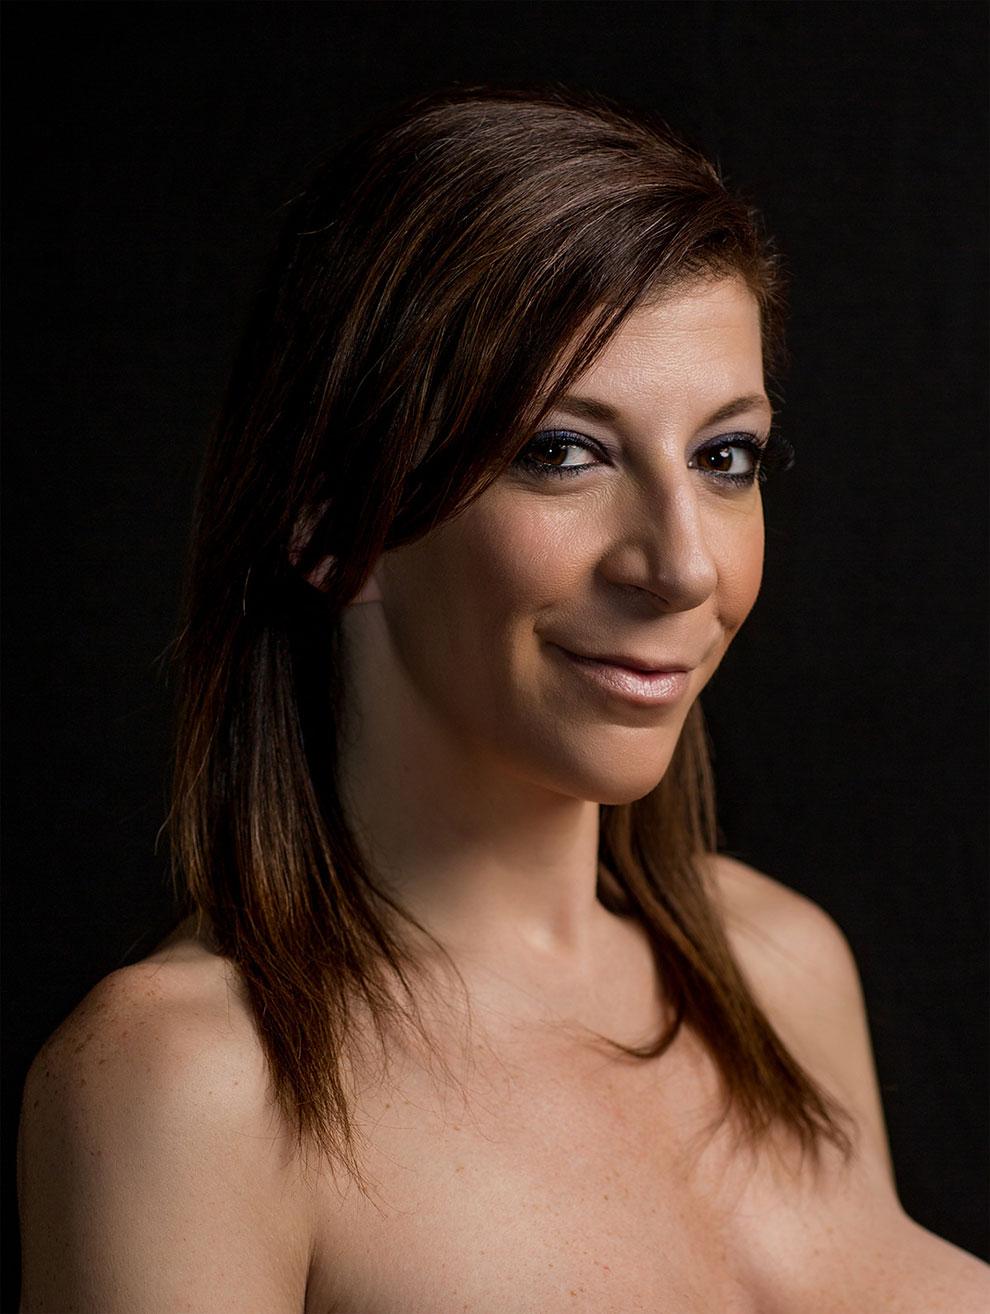 24 Artistic Porn-Star Portraits - Wow Gallery | eBaums World